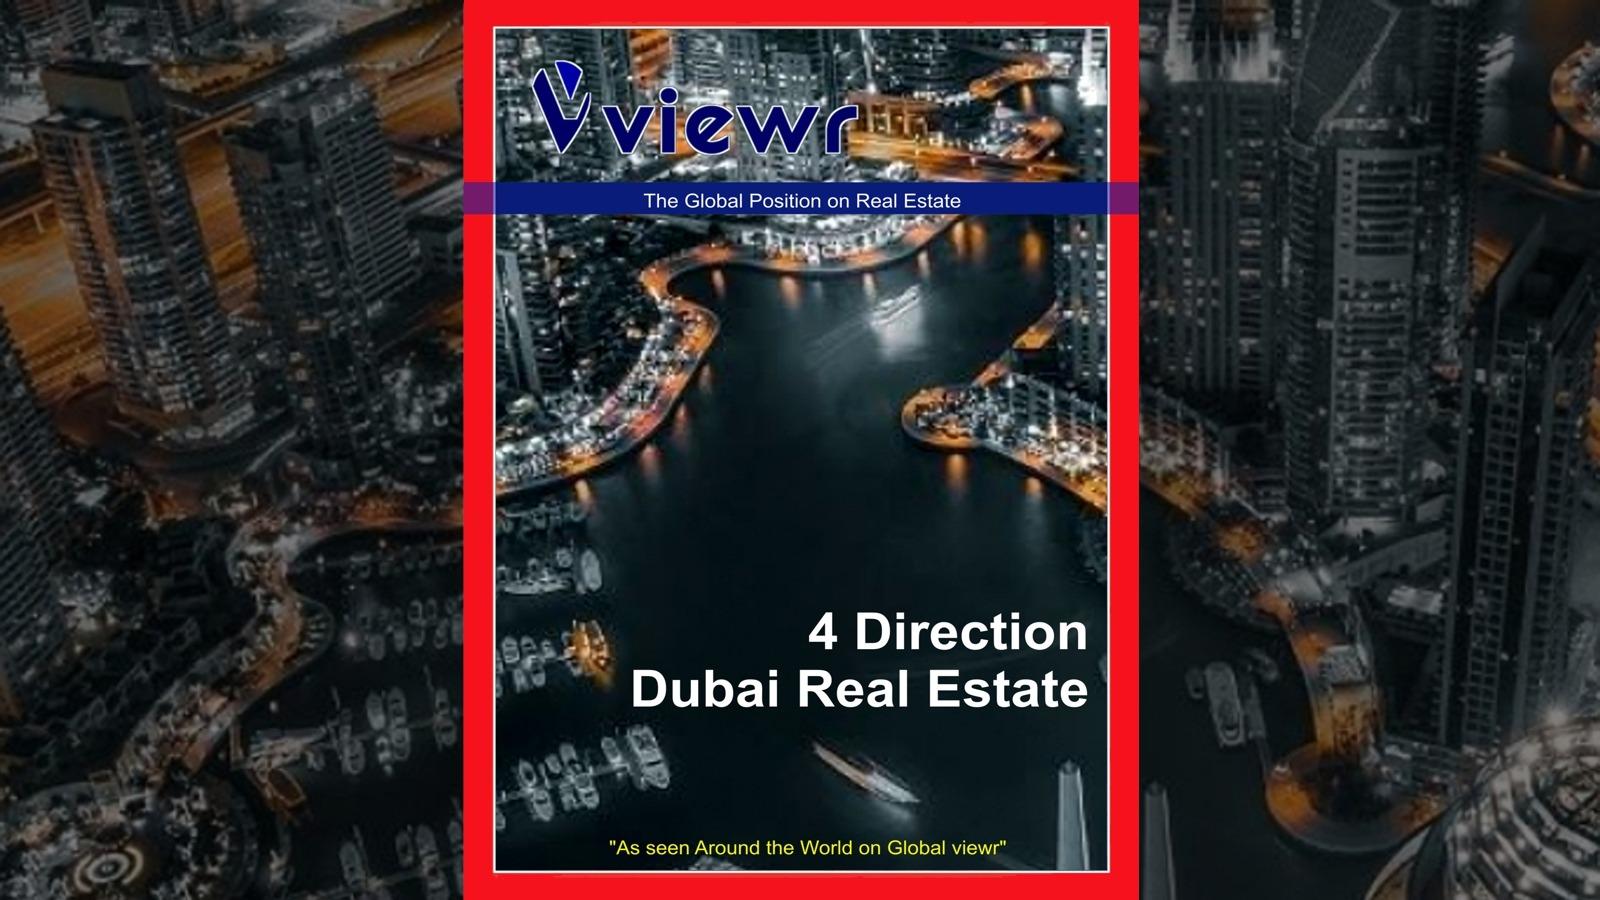 Global viewr Magazine Four Direction Dubai Real Estate